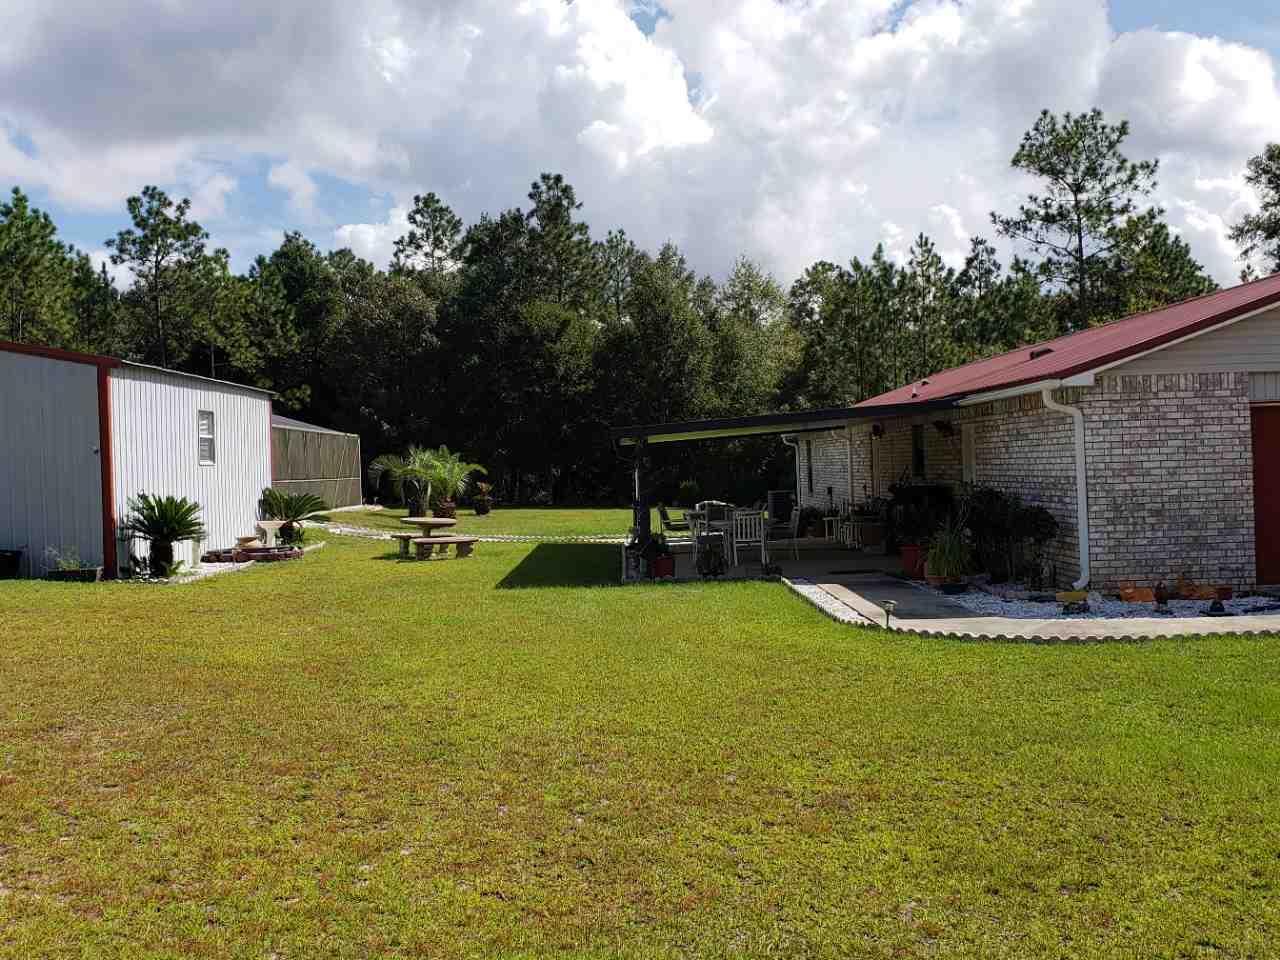 261 Oreo Dr, Molino, FL 32577